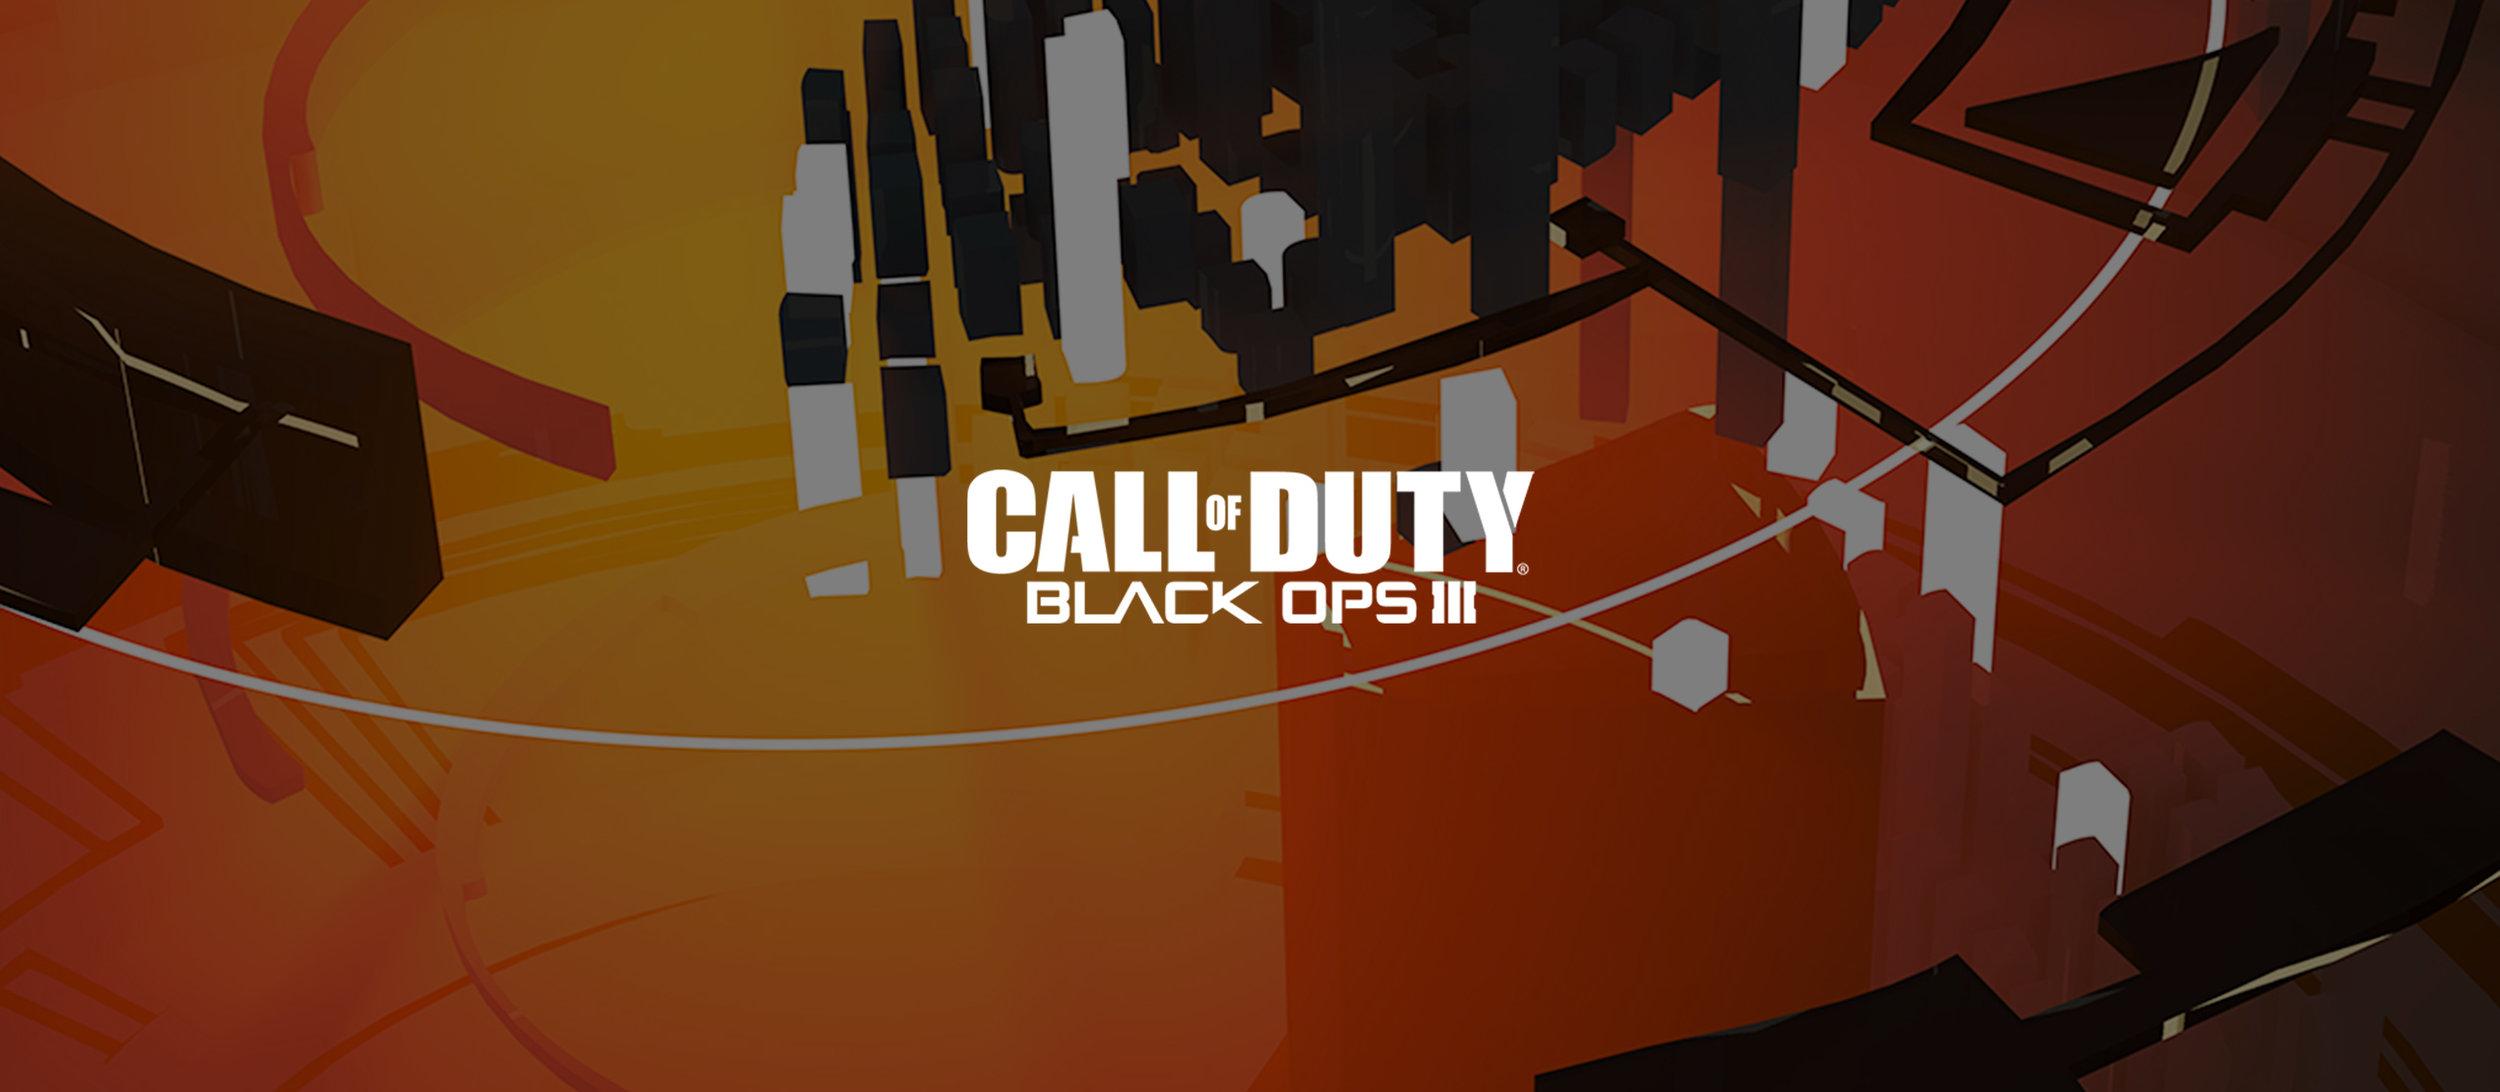 notdanmartin_home_call-of-duty-black-ops-3.jpg